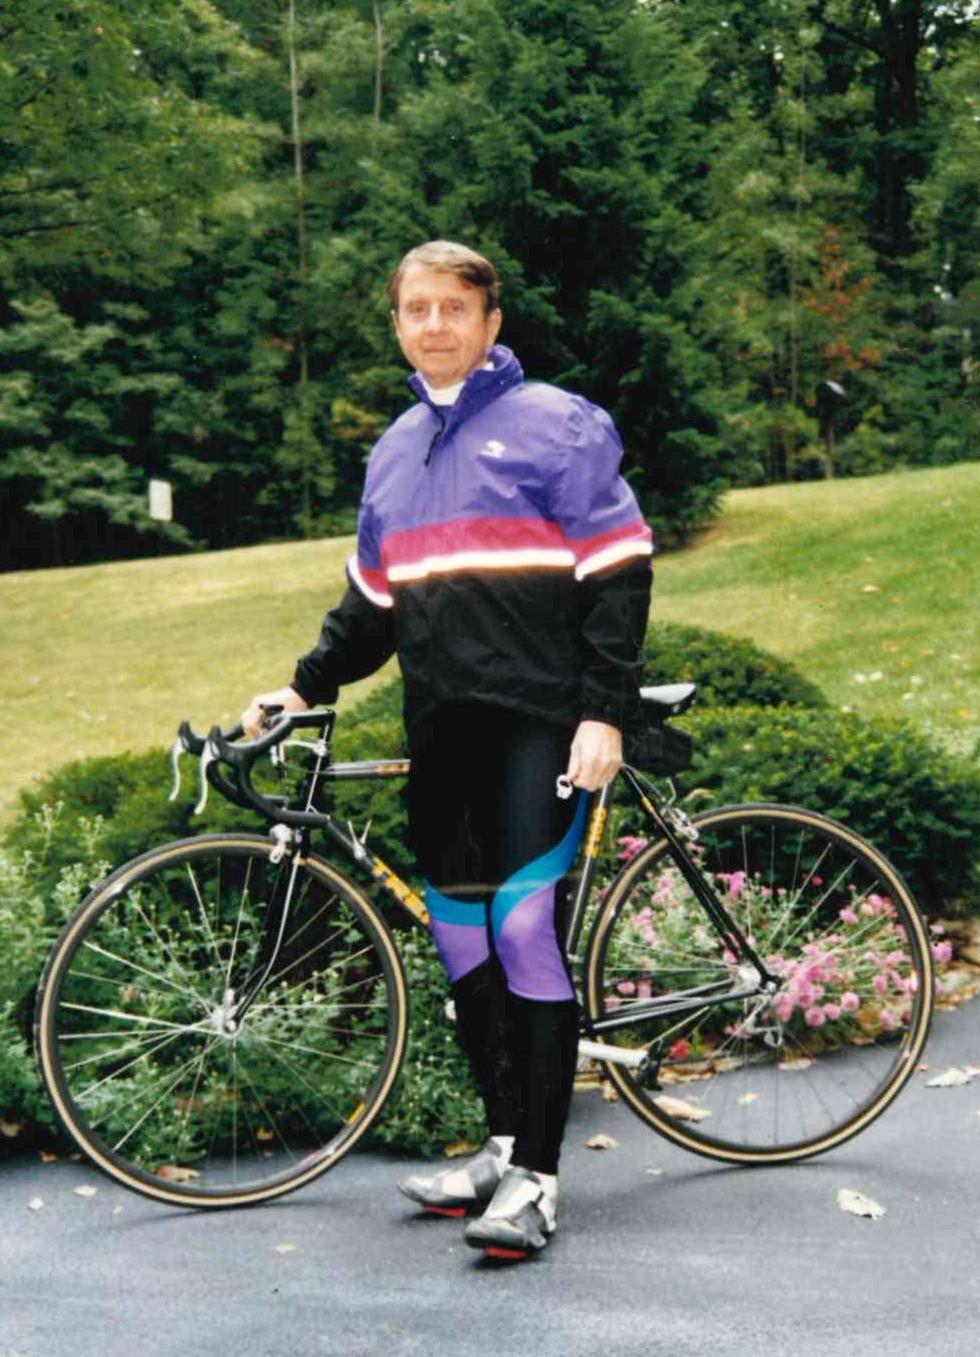 George loved to bike